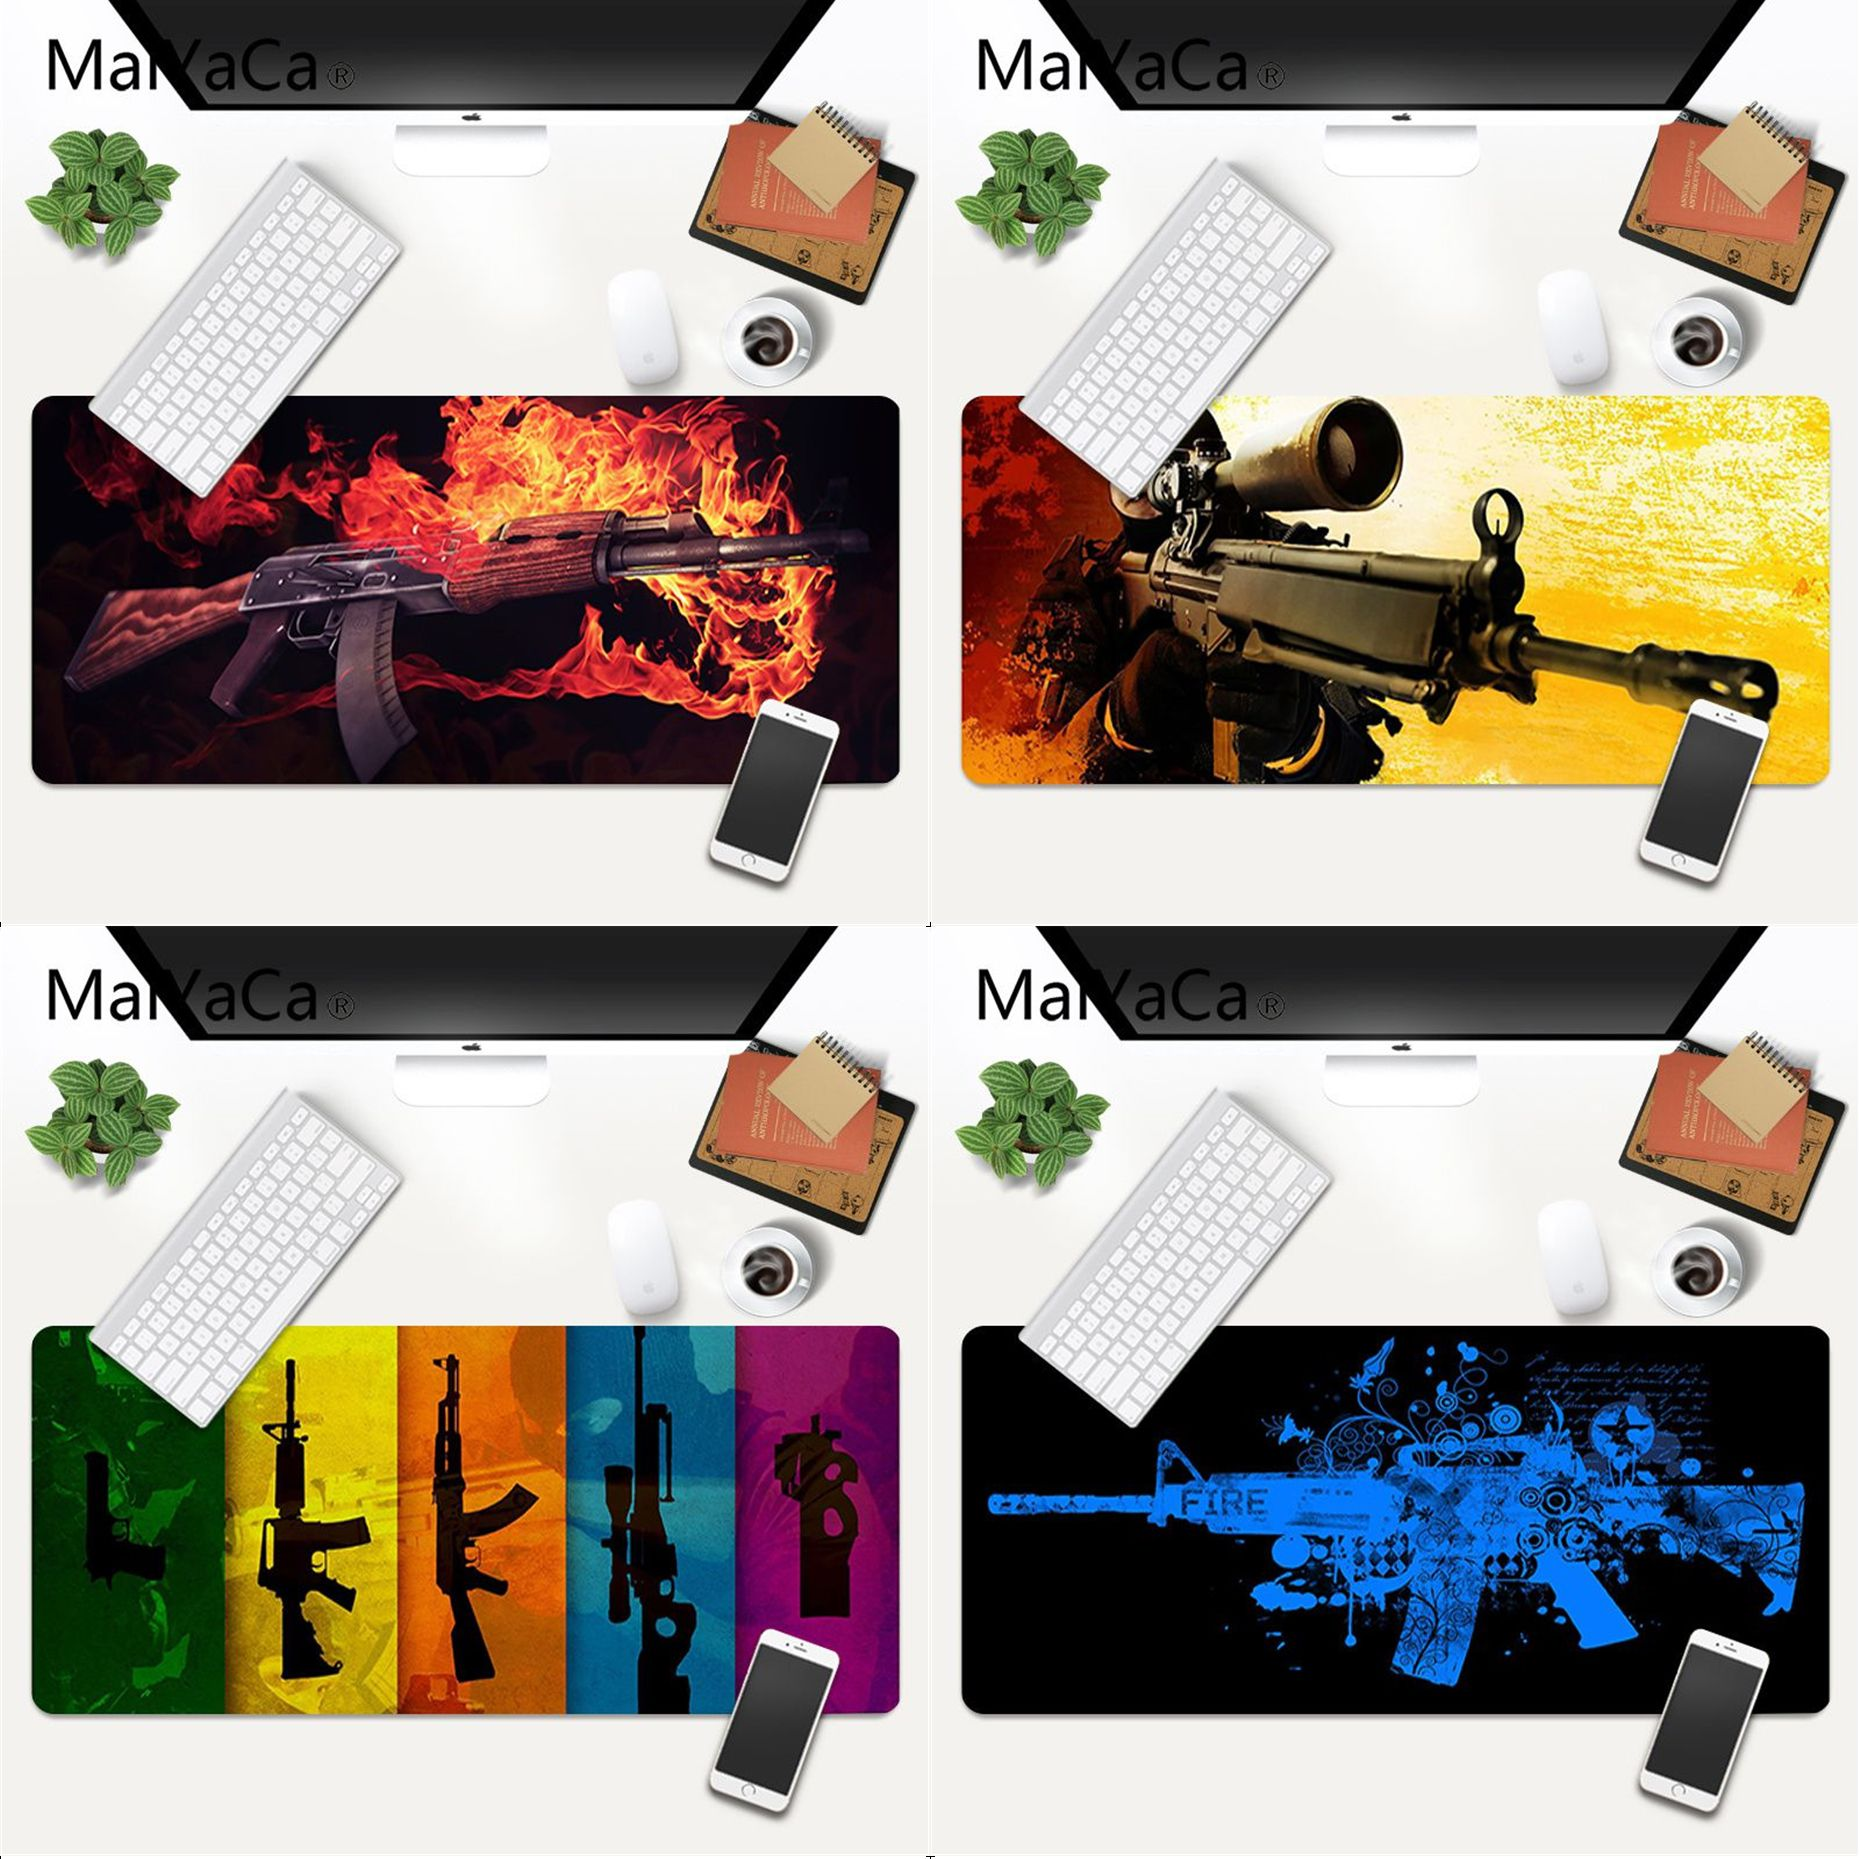 MaiYaCa Your Own Mats CS GO gun parts Laptop Gaming Mice Mousepad Gaming Mouse Pad Large Deak Mat 700x300mm for overwatch/cs go